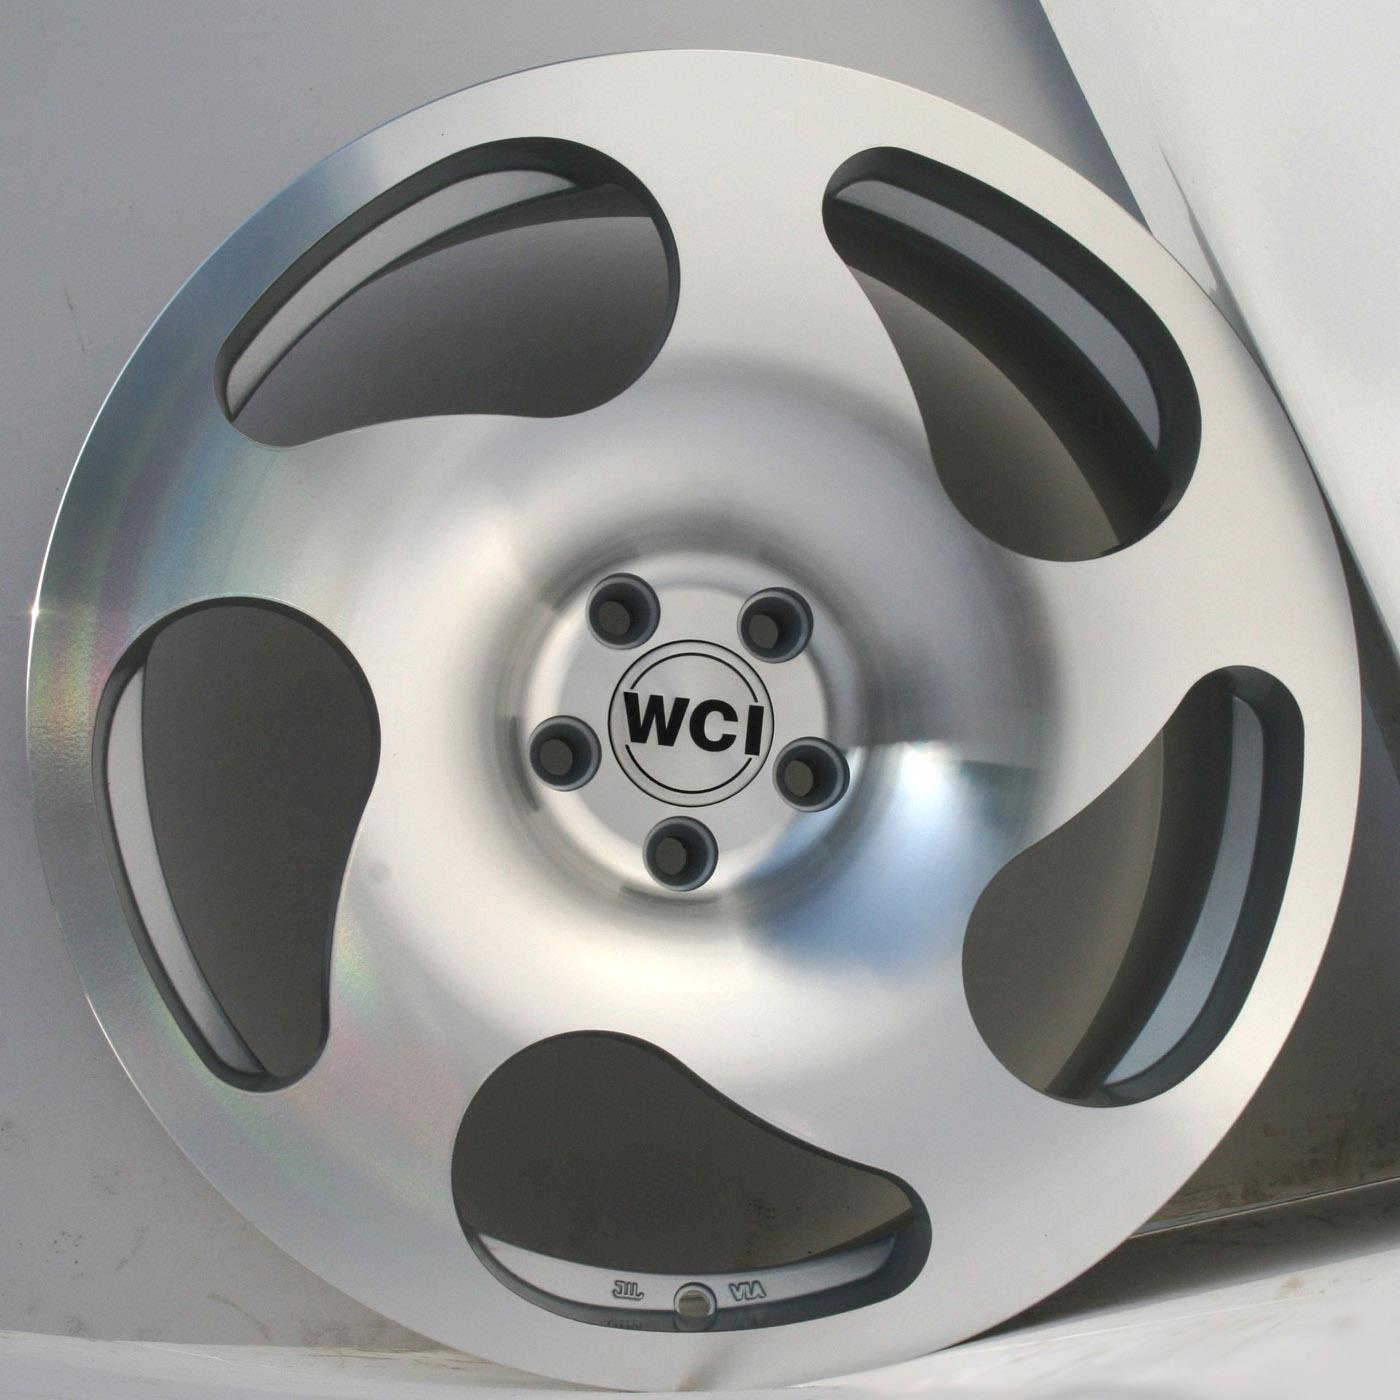 wci-cc10-4